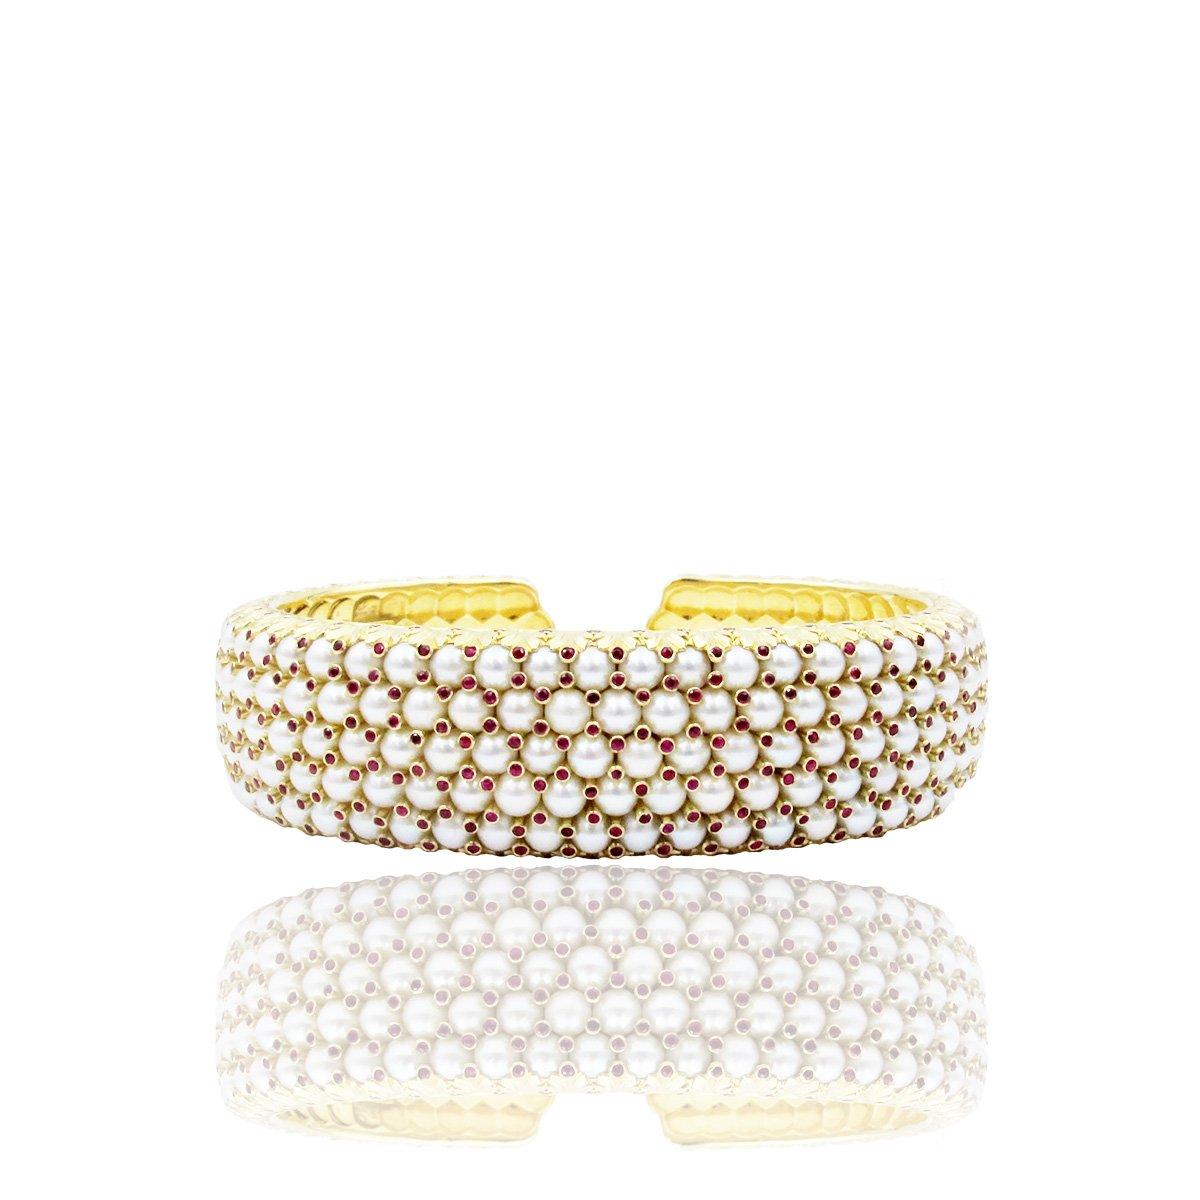 Ruby & Pearl Cuff Bracelet, 14K Yellow Gold